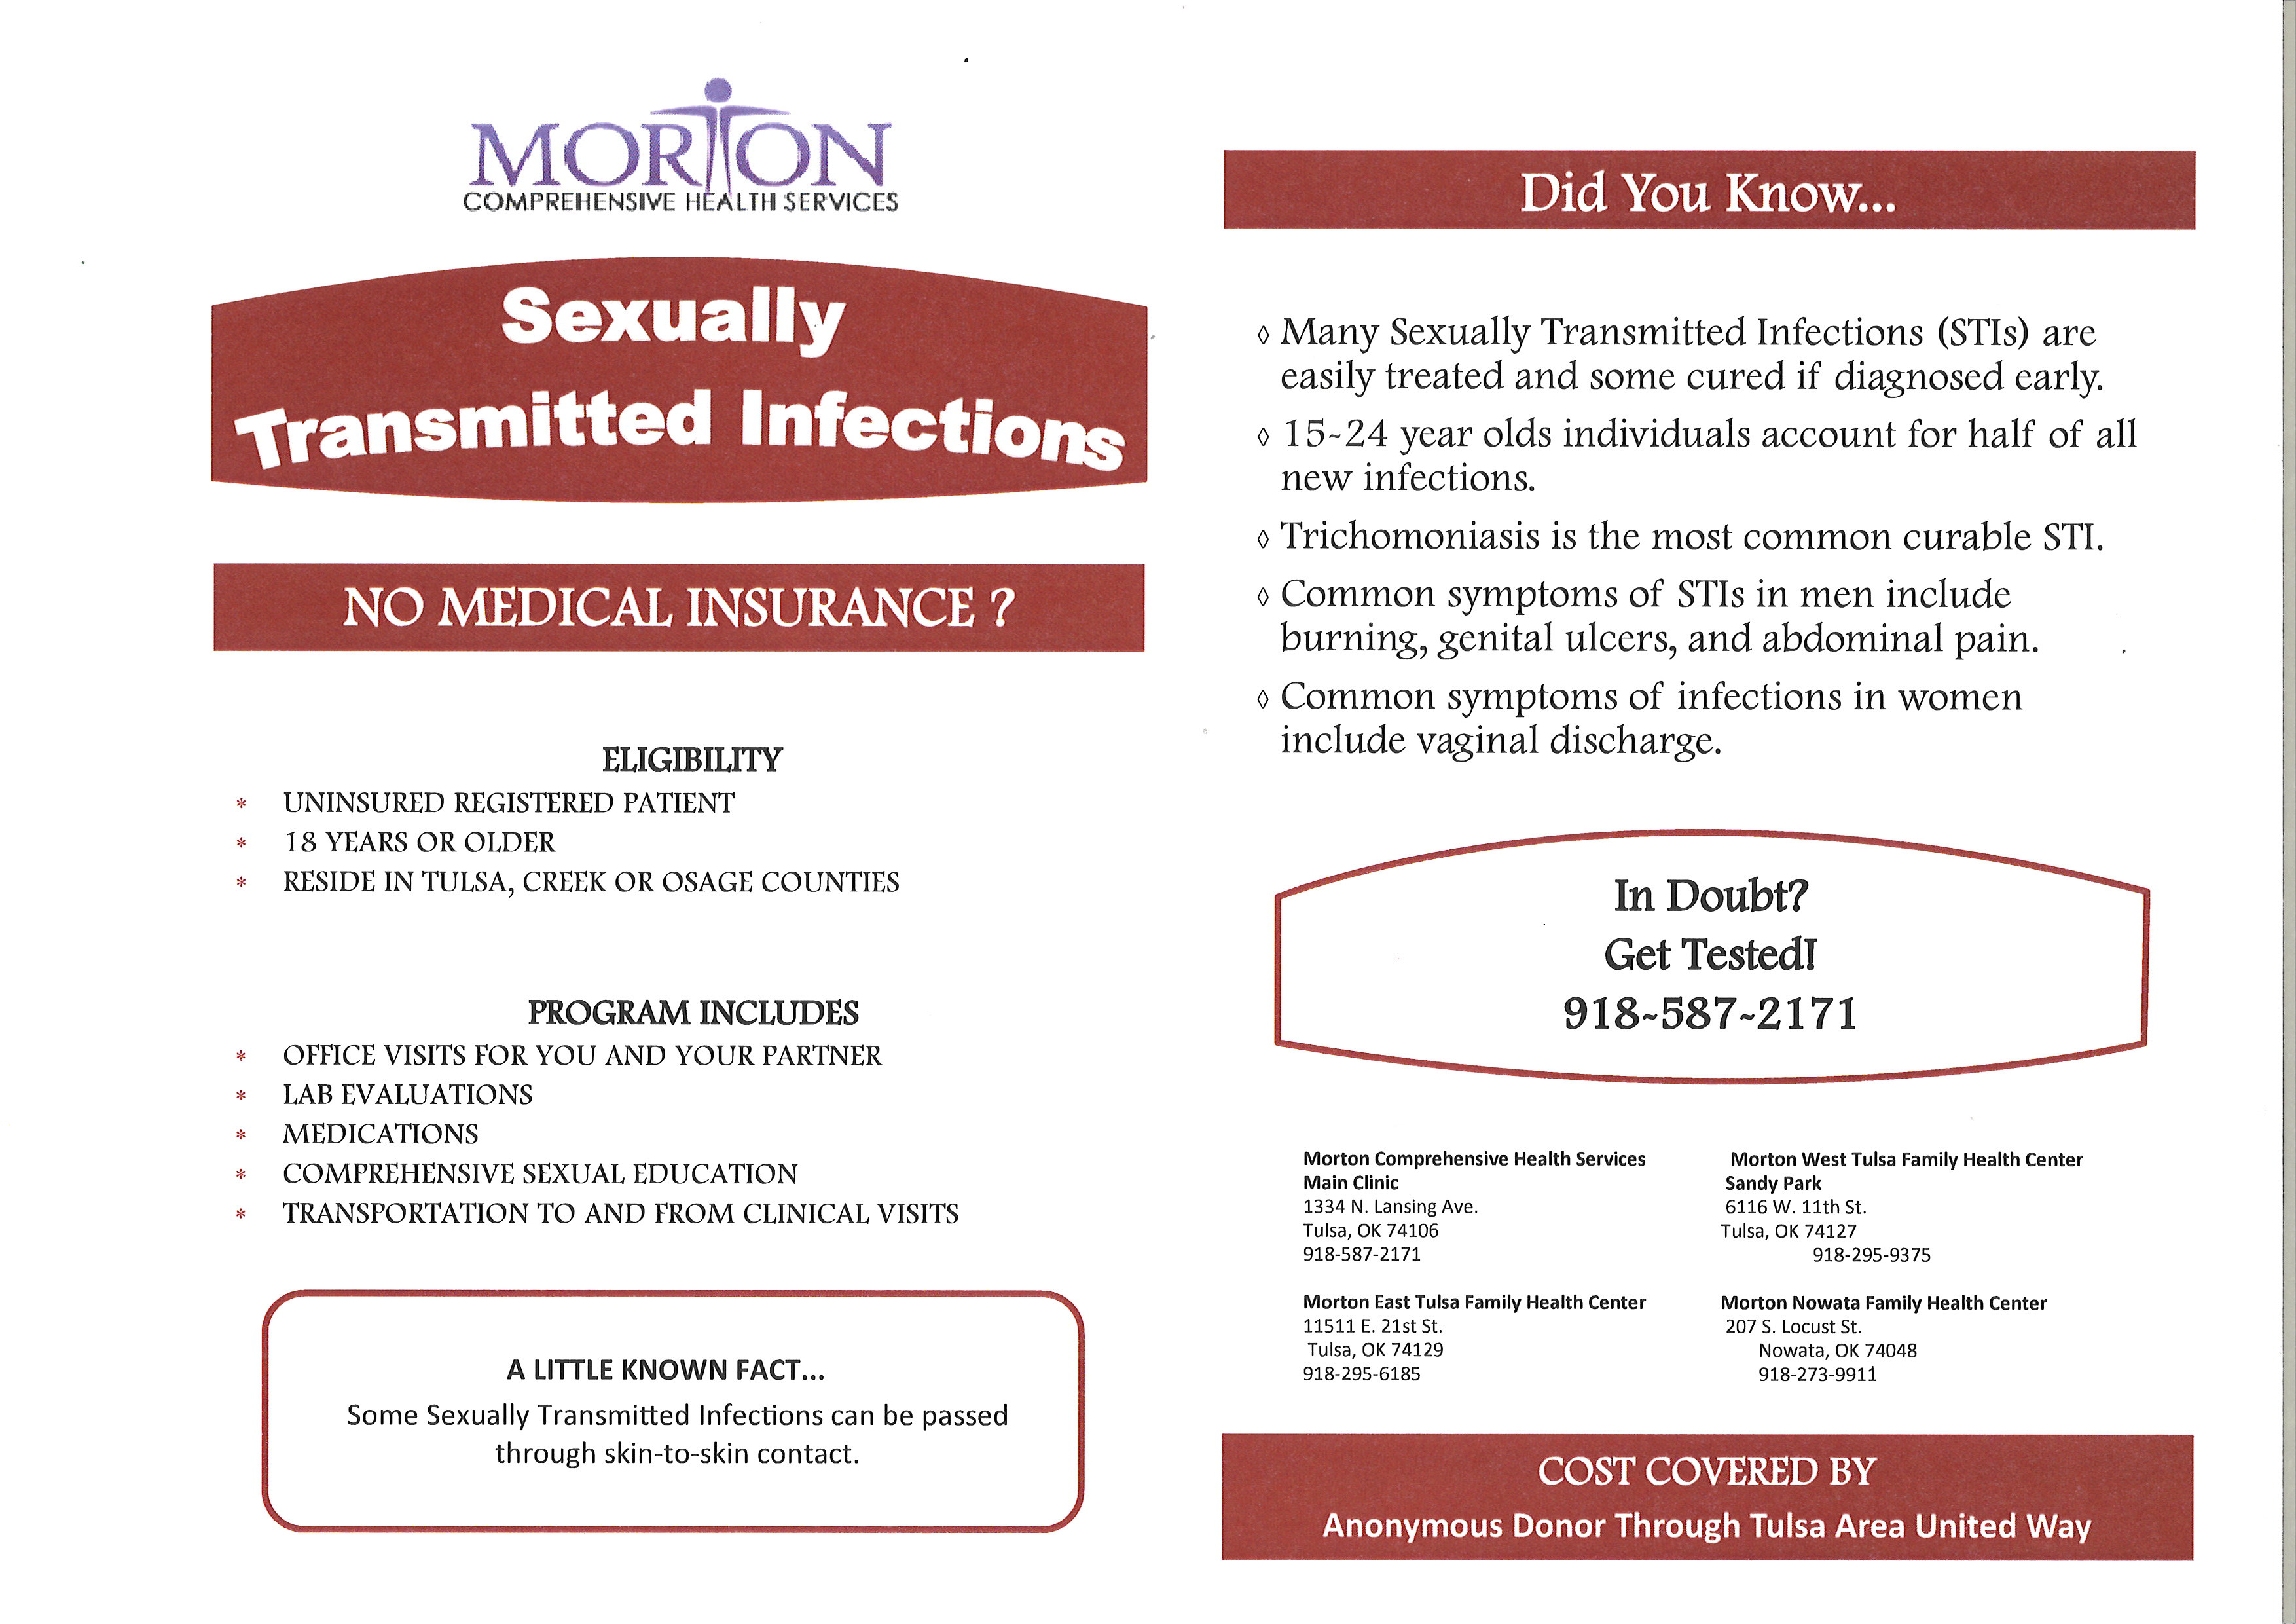 Communications   Morton Comprehensive Health Services